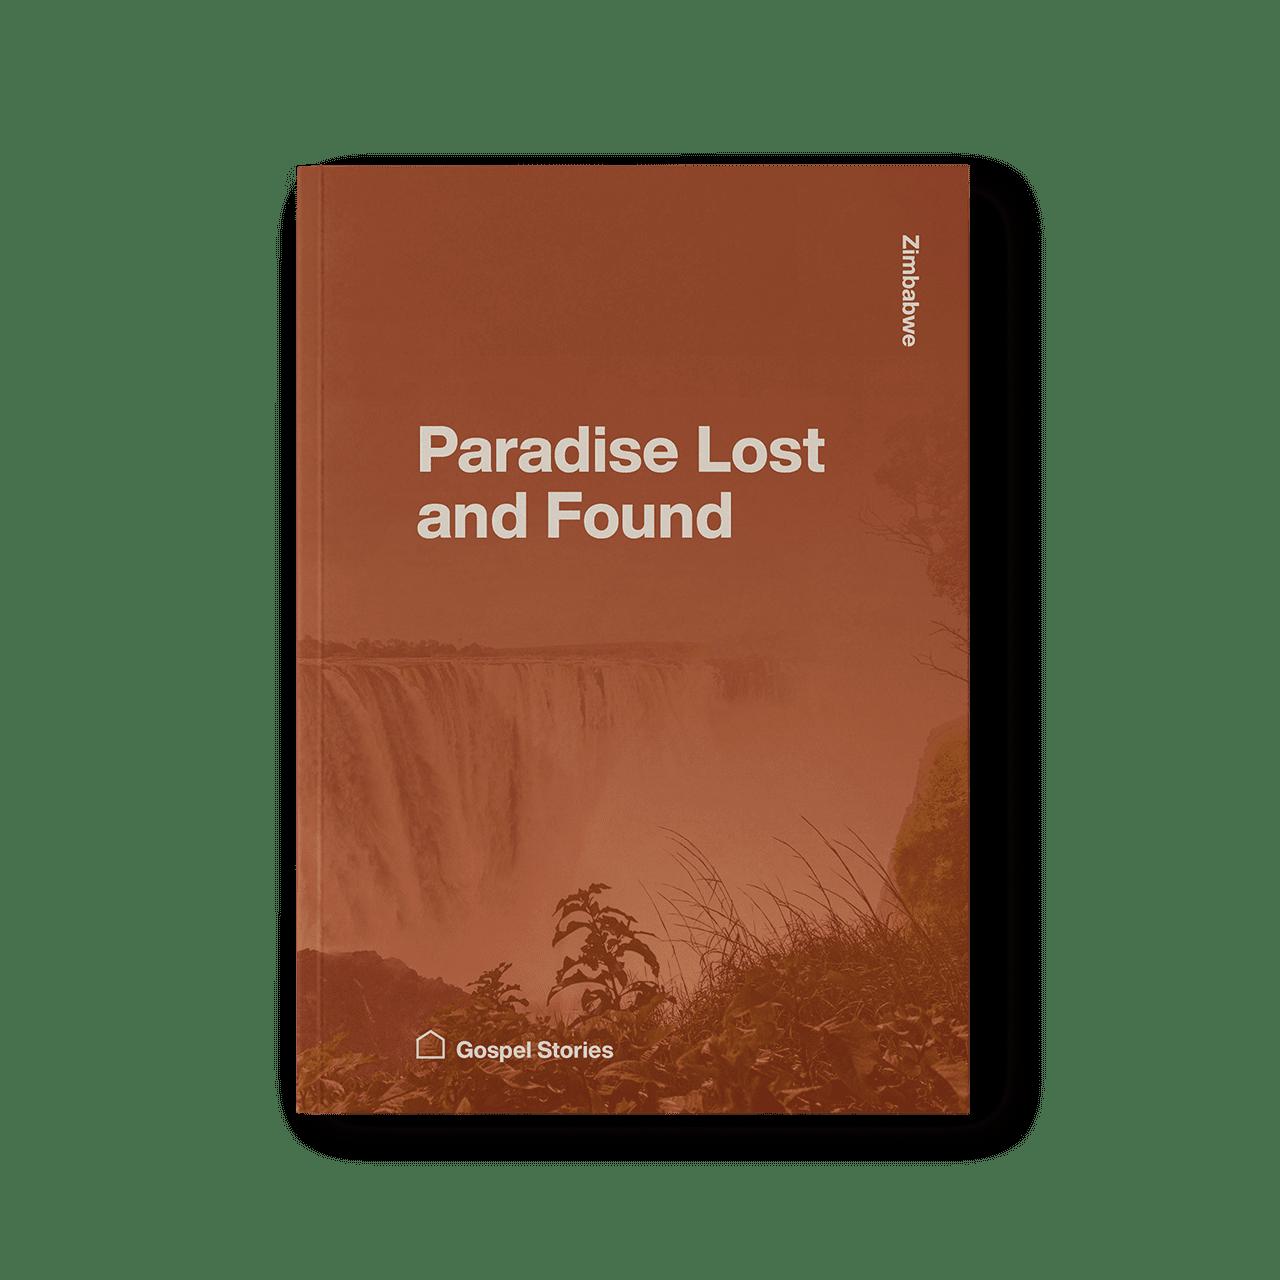 Zimbabwe Gospel Story